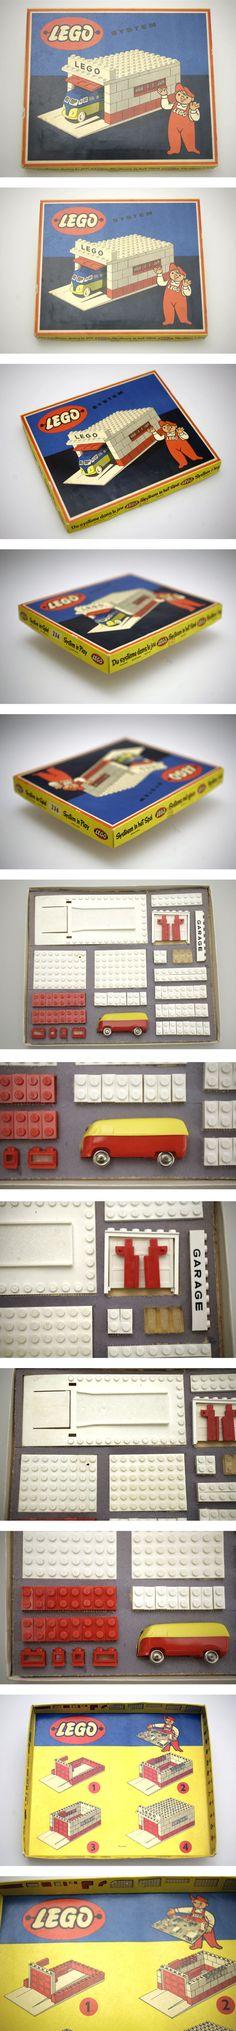 LEGO SET 236 from 1957 A true vintage gem! For Sale NOW on EBAY.DE  Lego envy